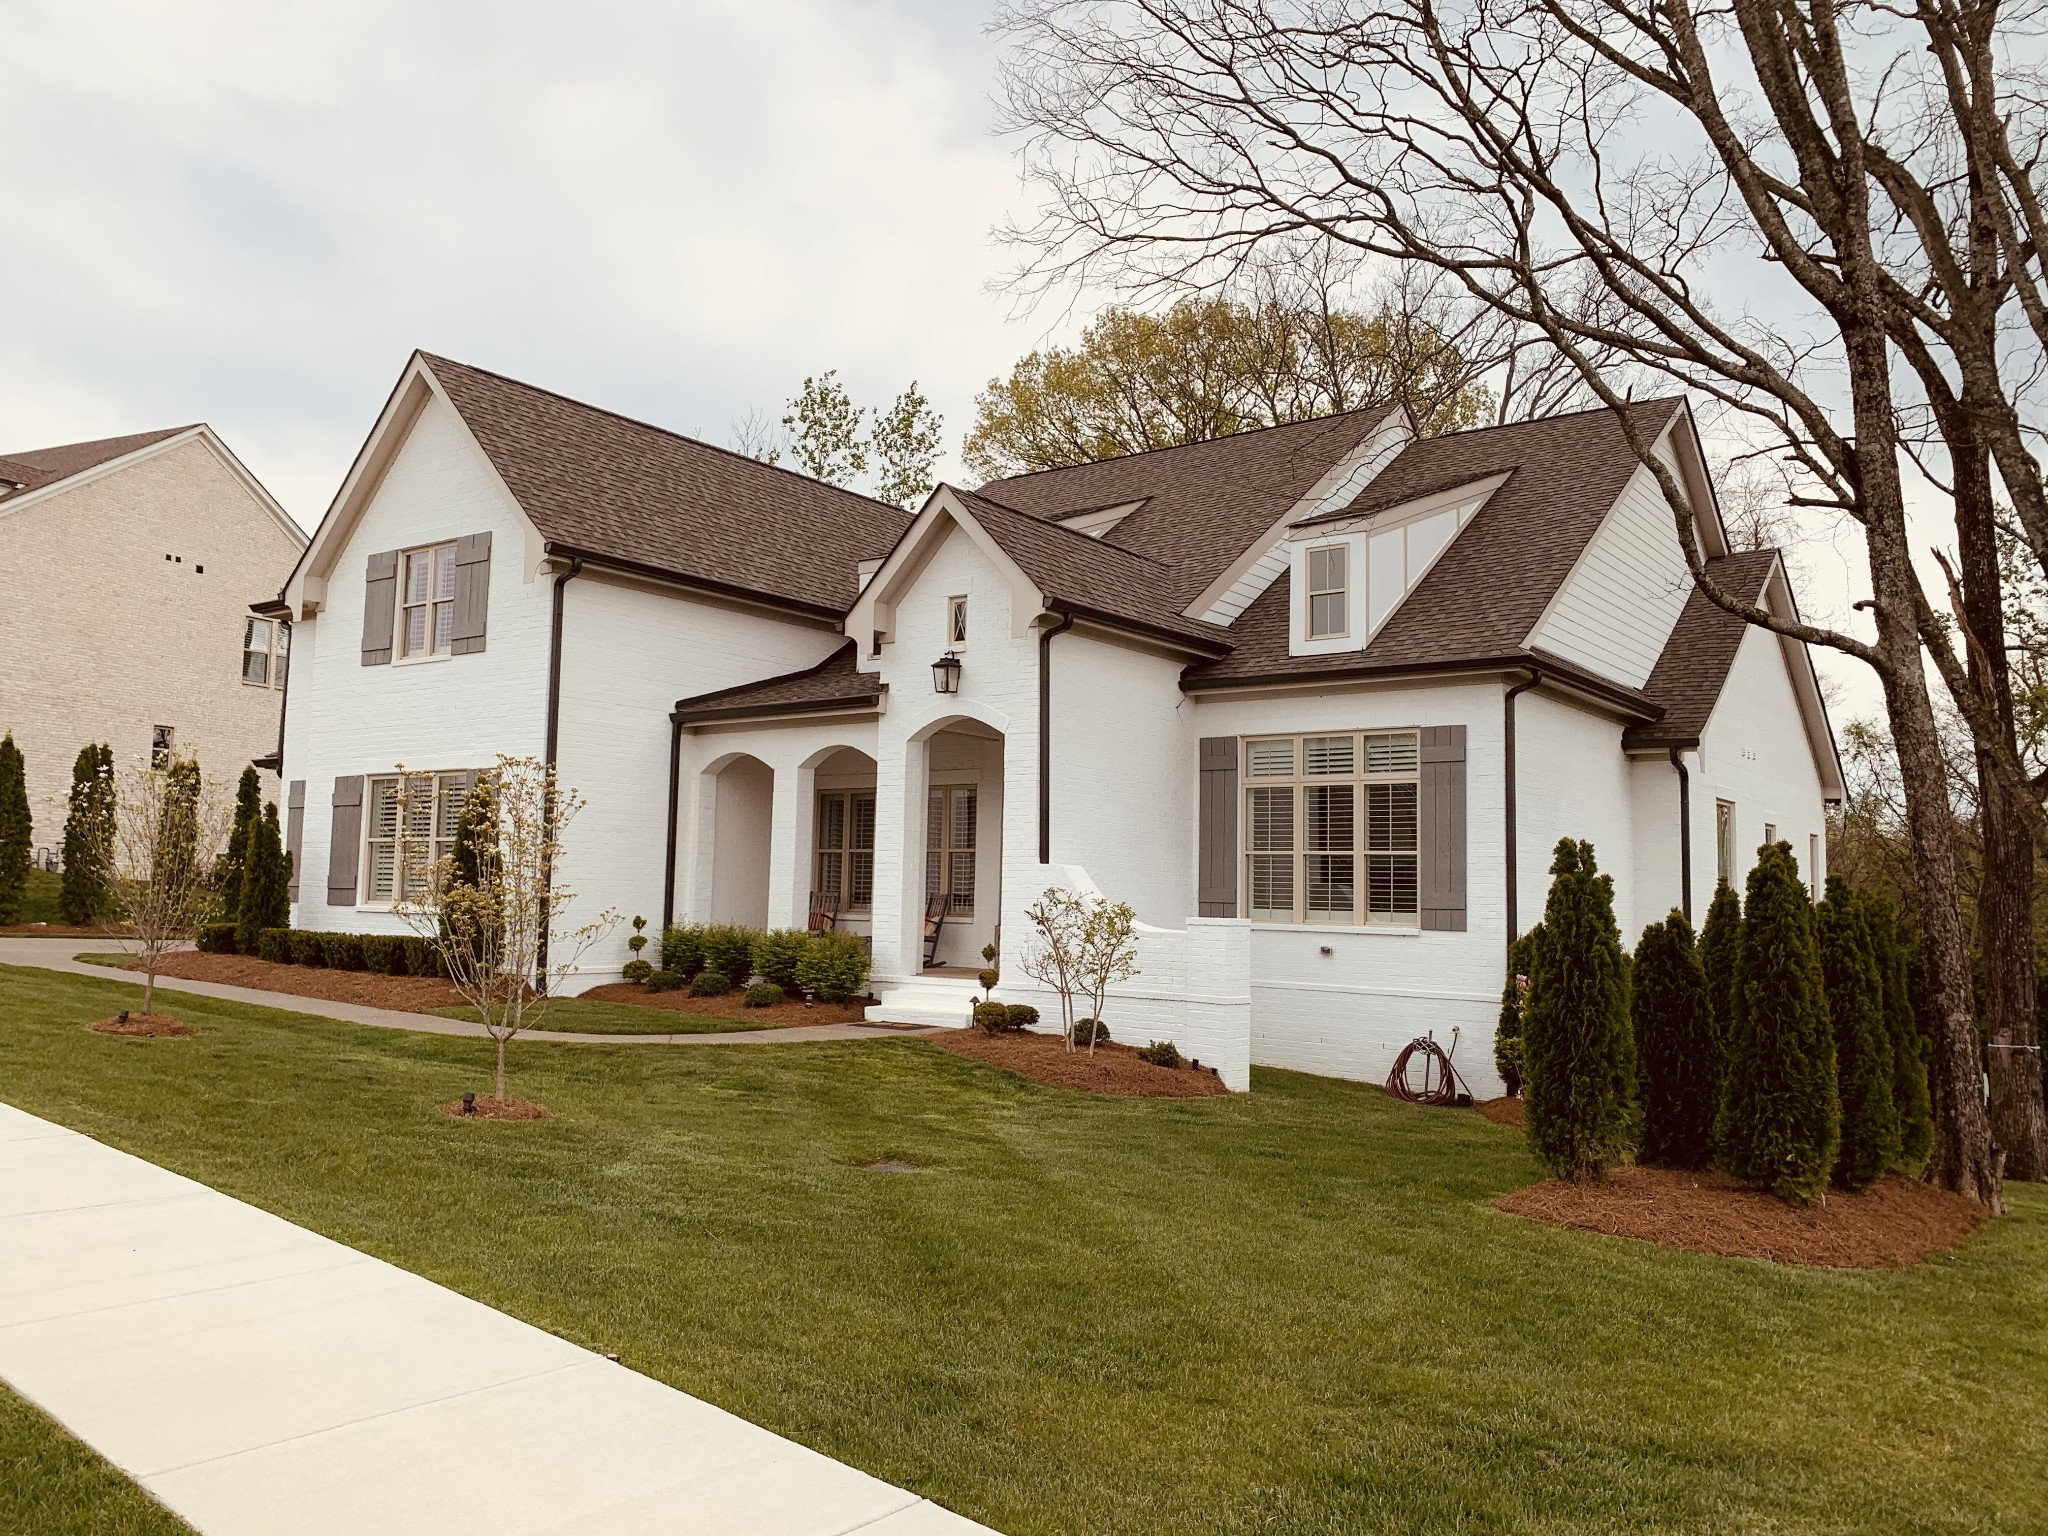 4637 Majestic Meadows Dr Property Photo - Arrington, TN real estate listing